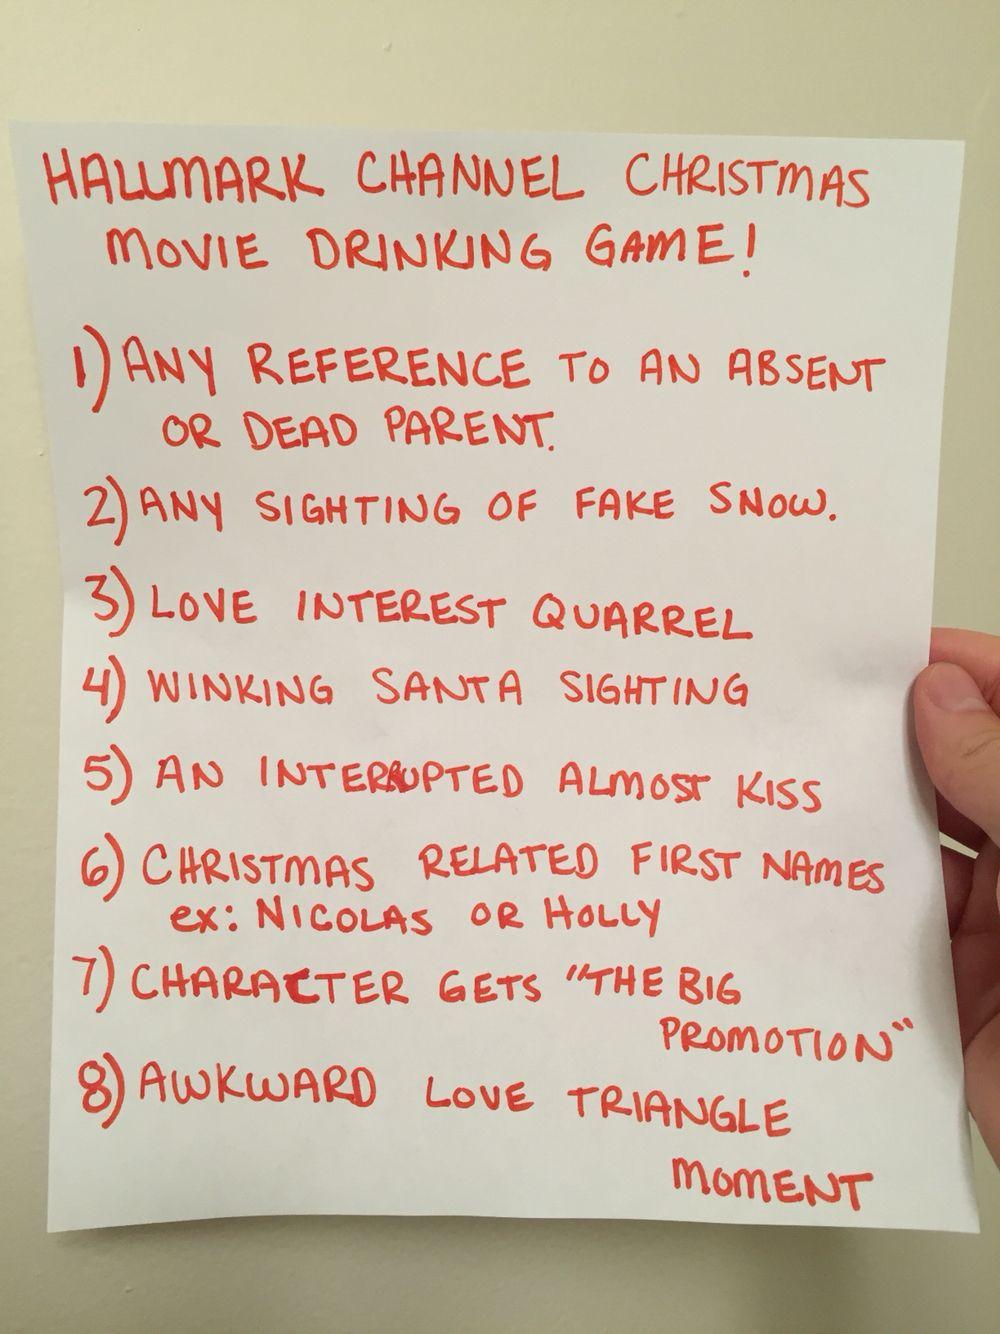 Christmas In July Hallmark Meme.The Hallmark Channel Christmas Movie Drinking Game Random